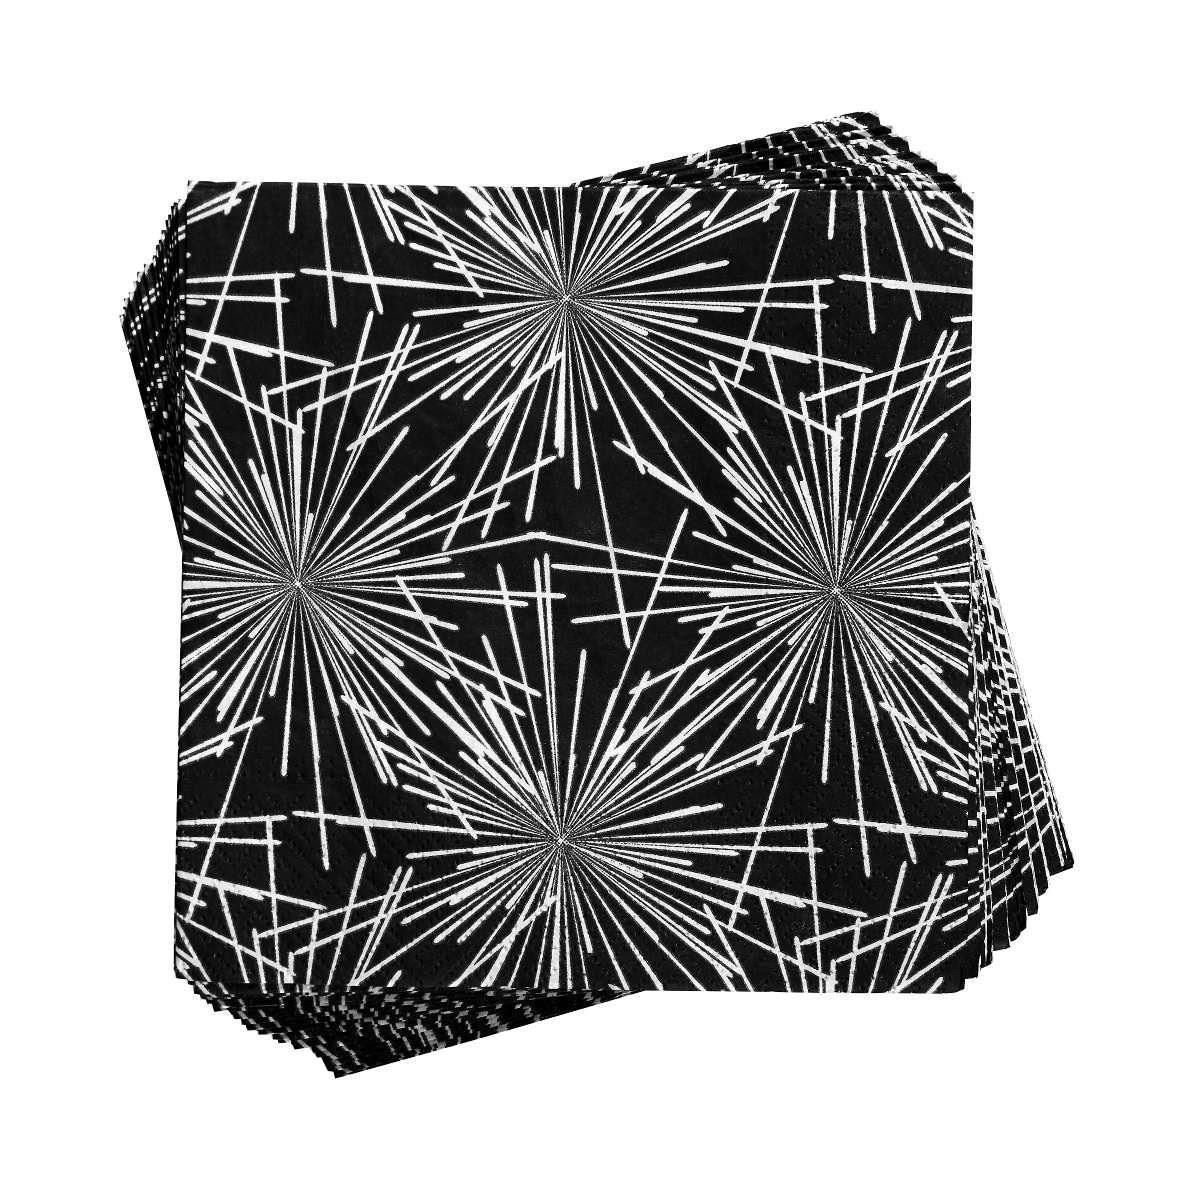 BUTLERS APRÈS »Papierserviette Silvester Feuerwerk«